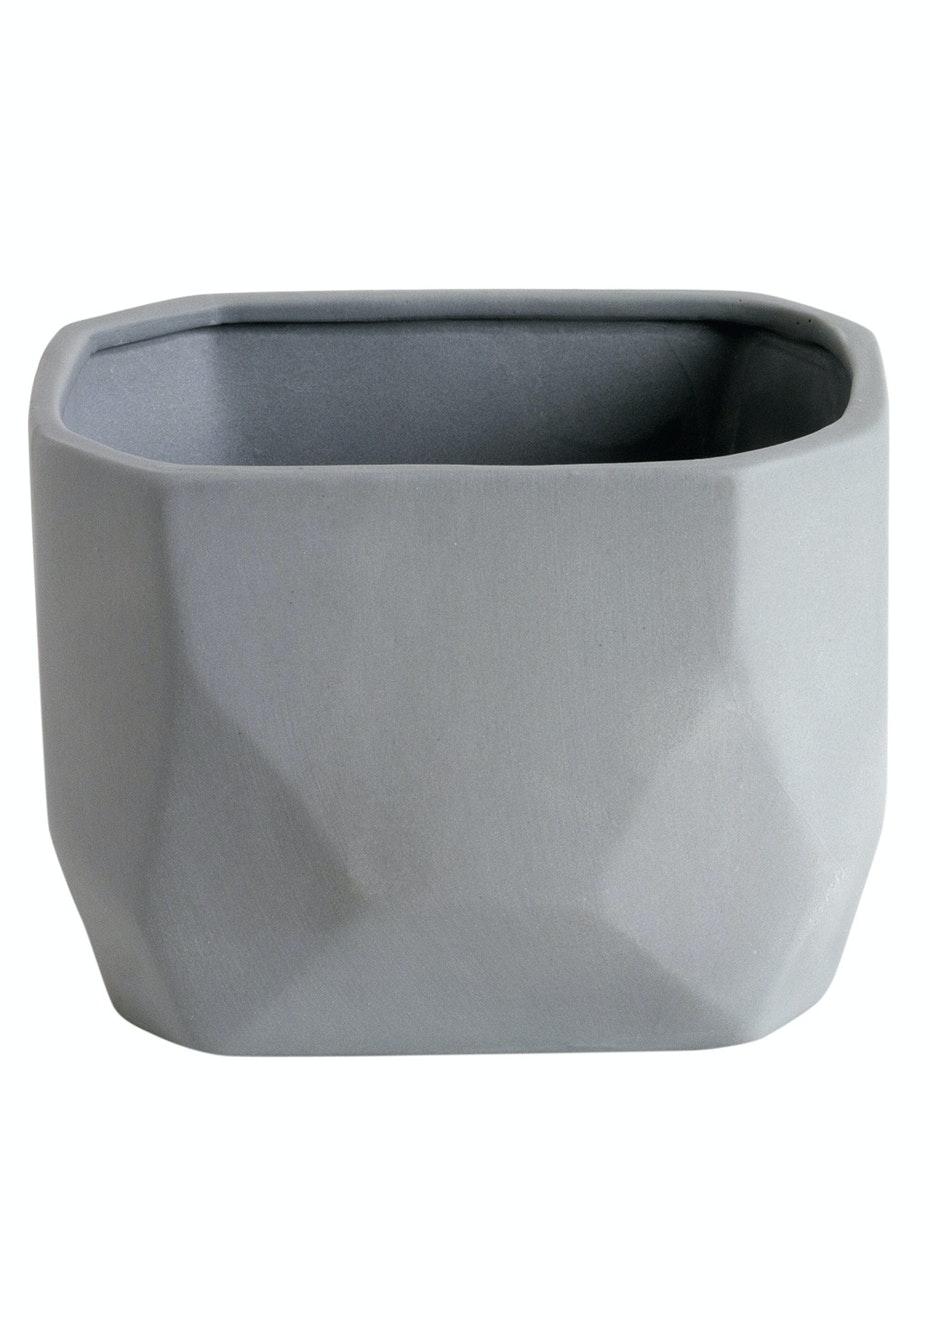 Jason - Ceramic Geormetric Vase - Grey